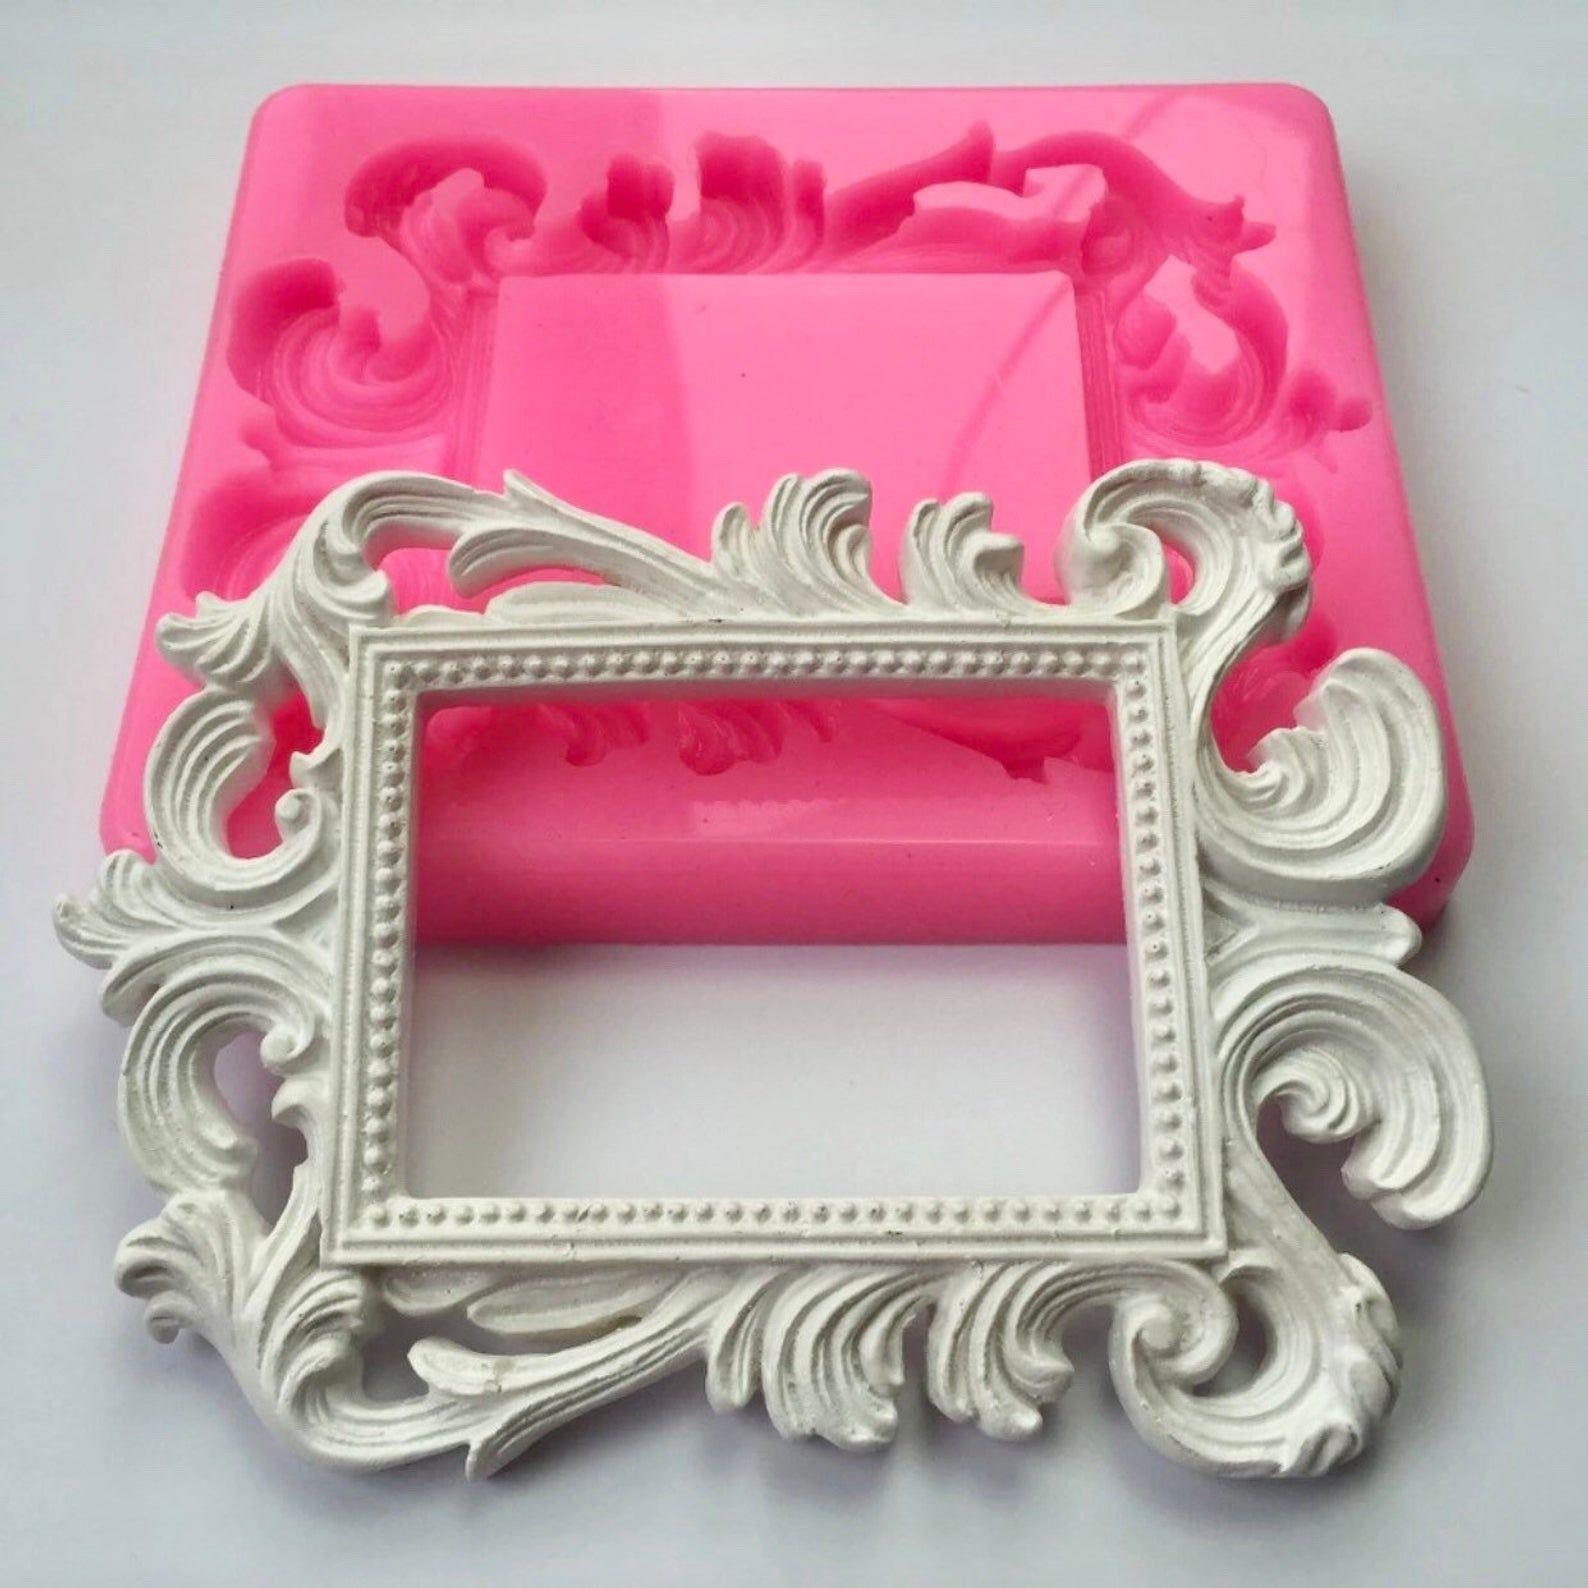 Xl Royal Frame Silicone Mold Extra Large Fondant Mold Etsy Resin Crafts Silicone Molds Royal Frame